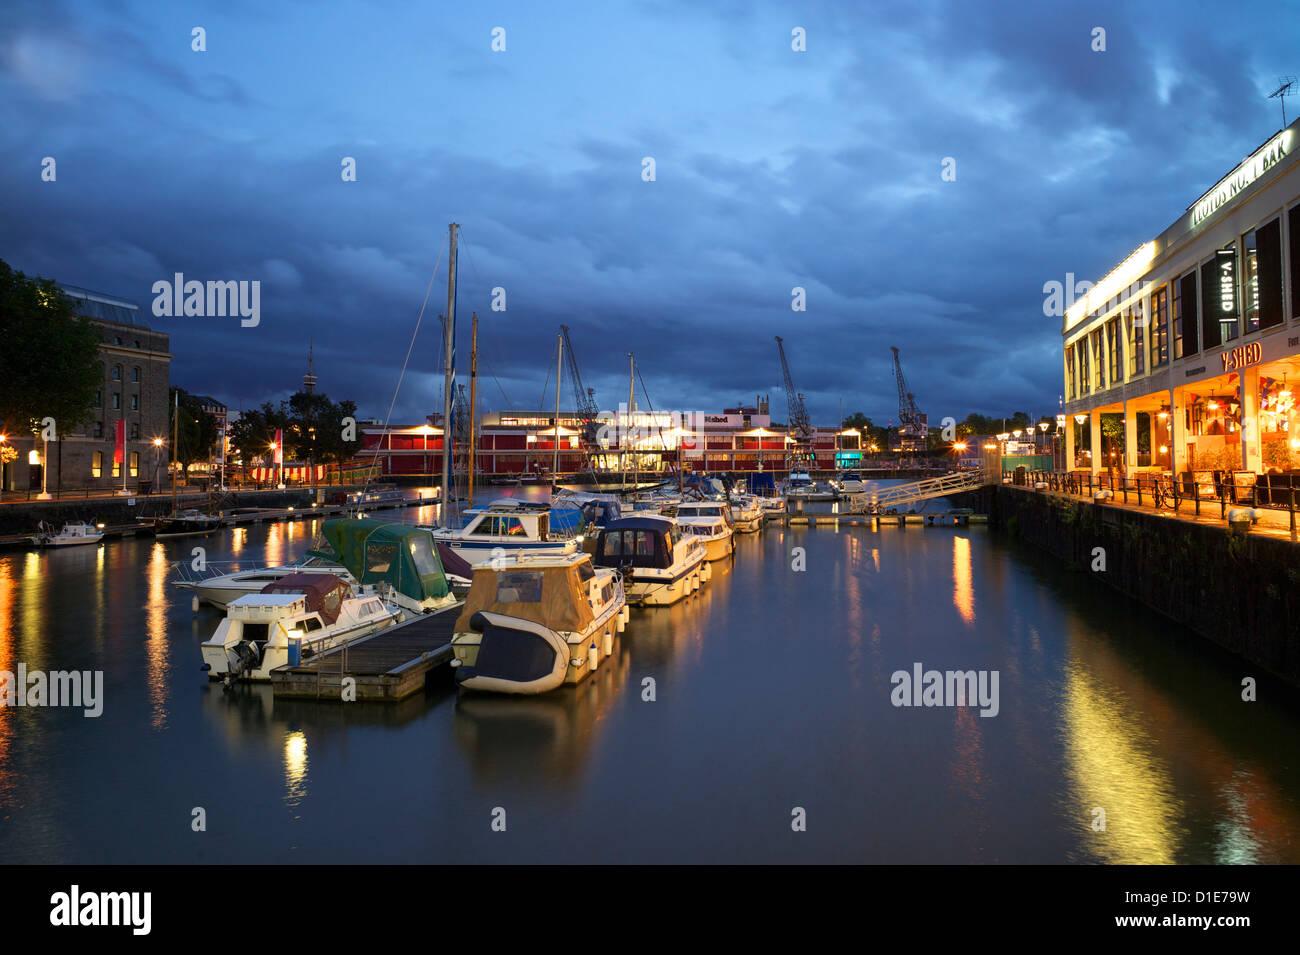 St. Augustine's Reach, harbour, Bristol, England, United Kingdom, Europe - Stock Image